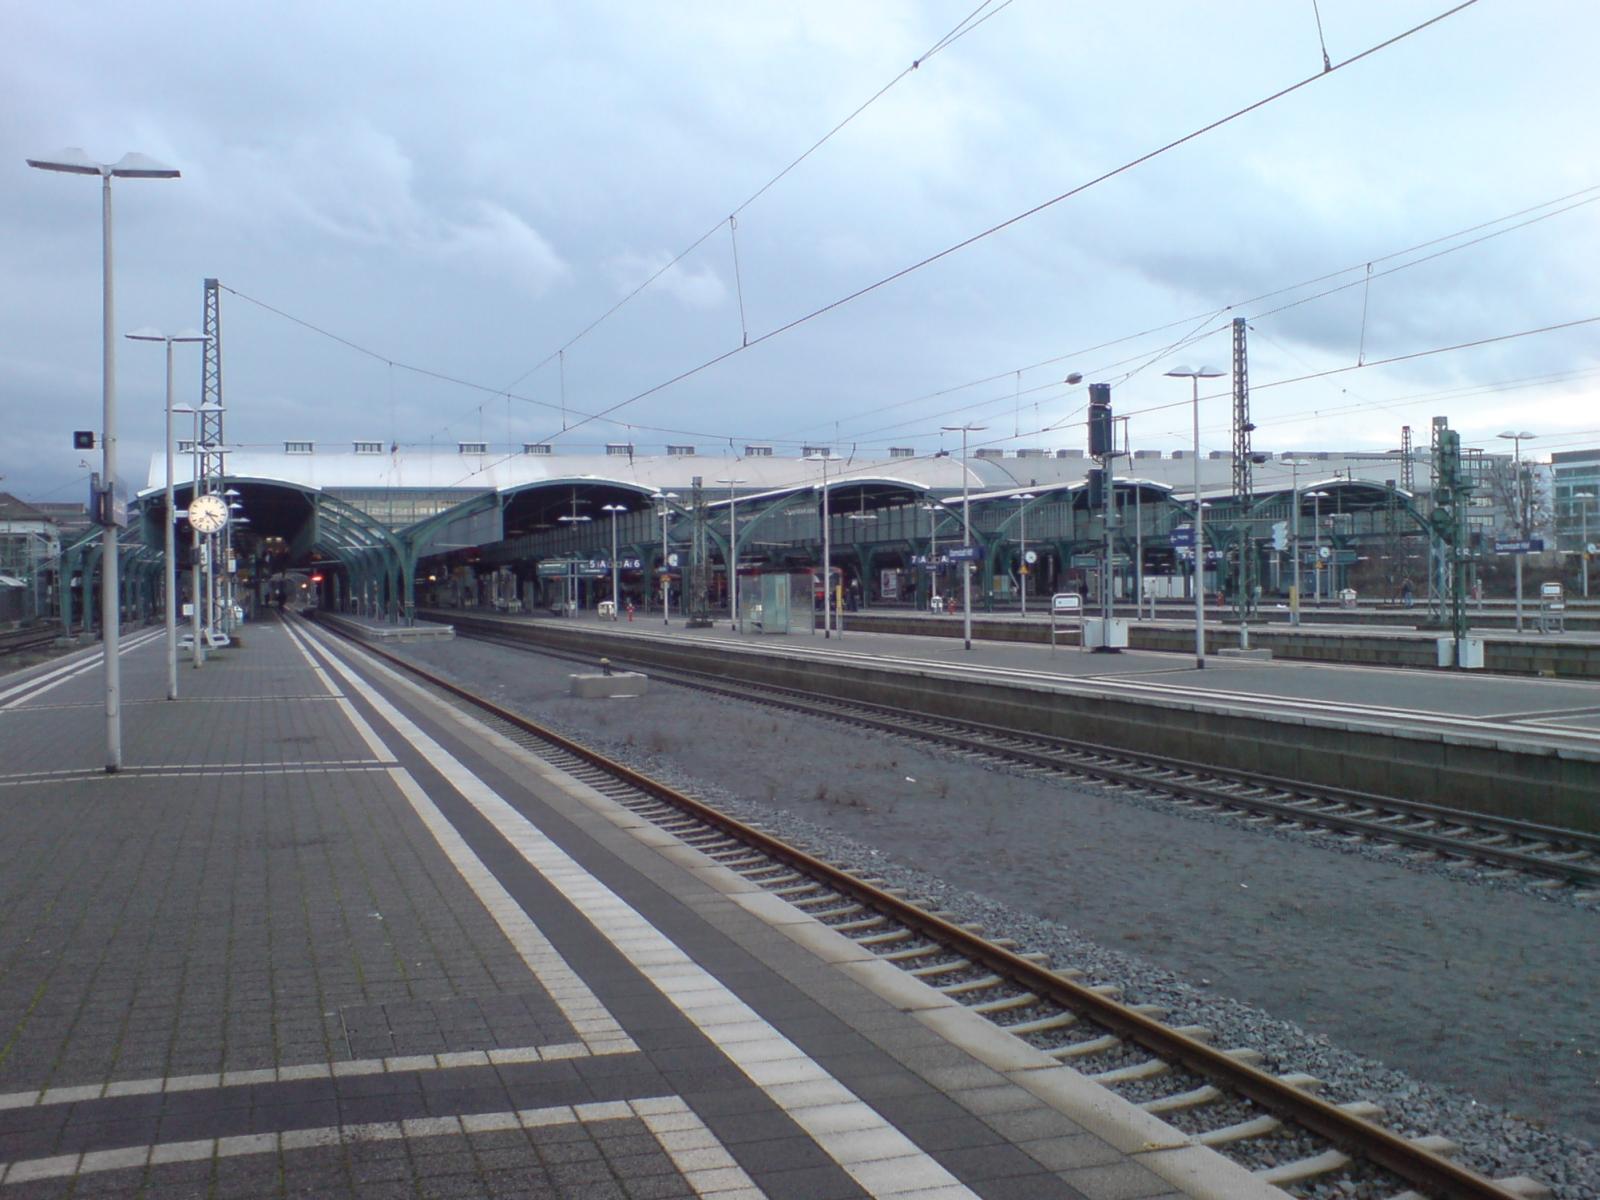 FileExtents Of Darmstadt Hauptbahnhofjpg Wikimedia Commons